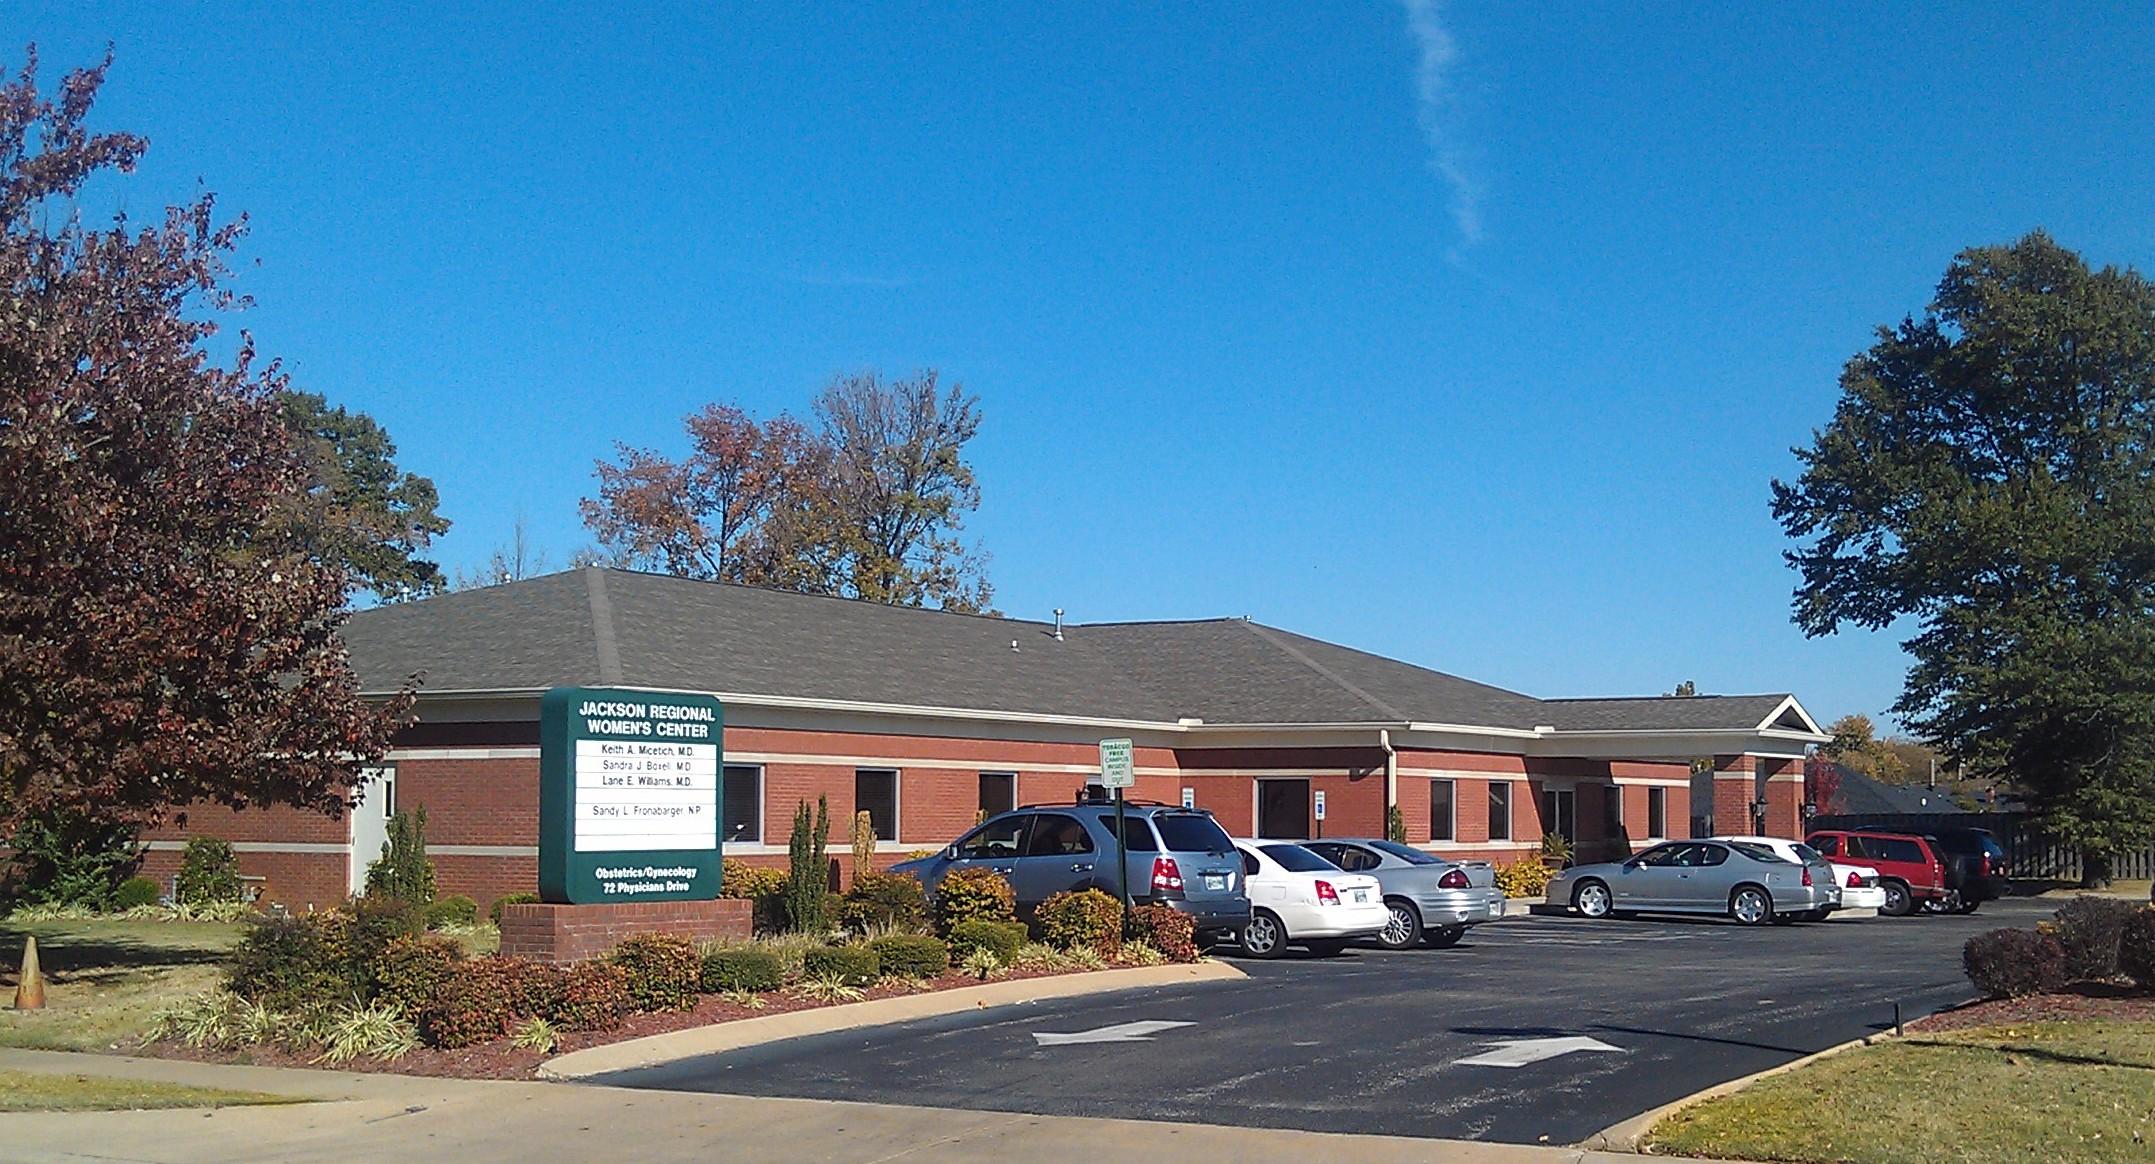 Jackson Regional Woman's Clinic